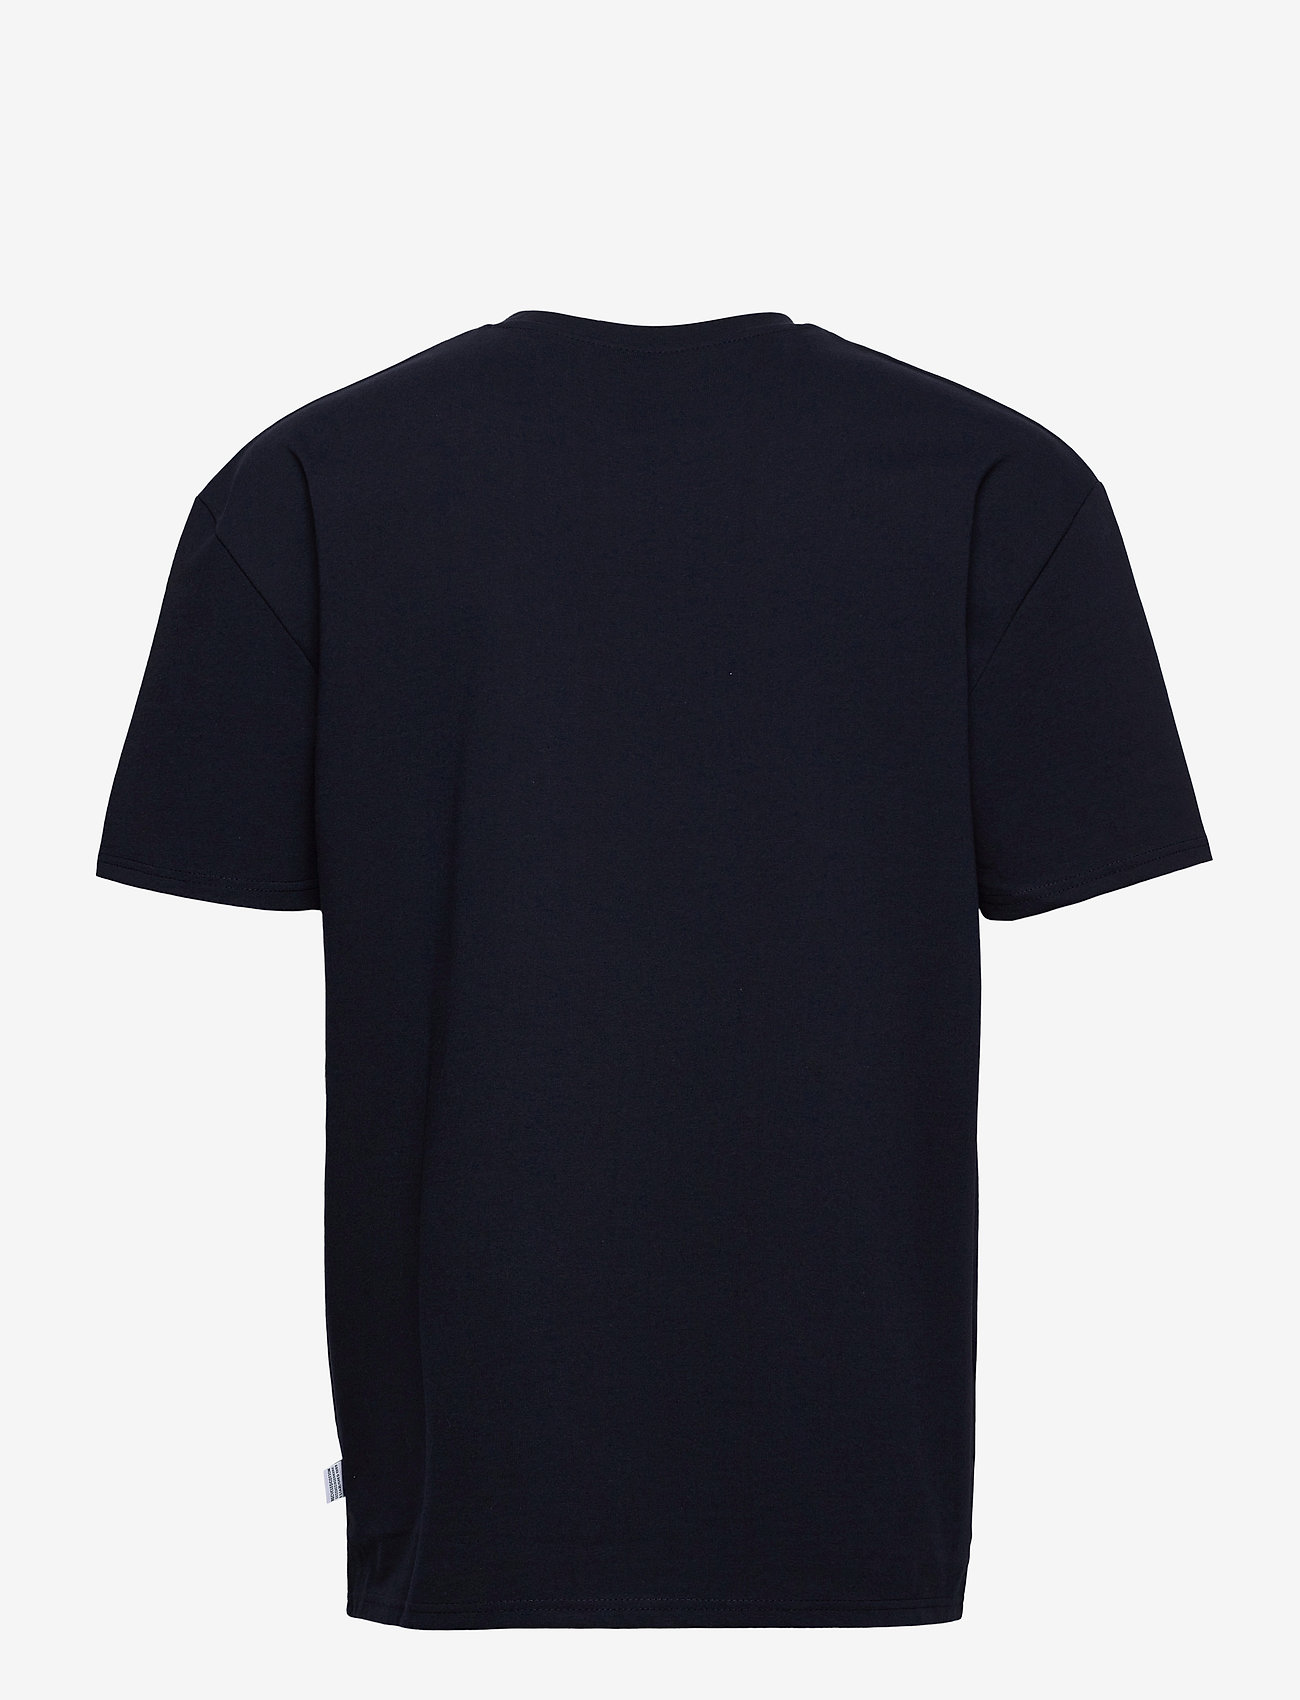 Kronstadt - Martin Recycled cotton boxfit t-shirt - basic t-shirts - navy - 1